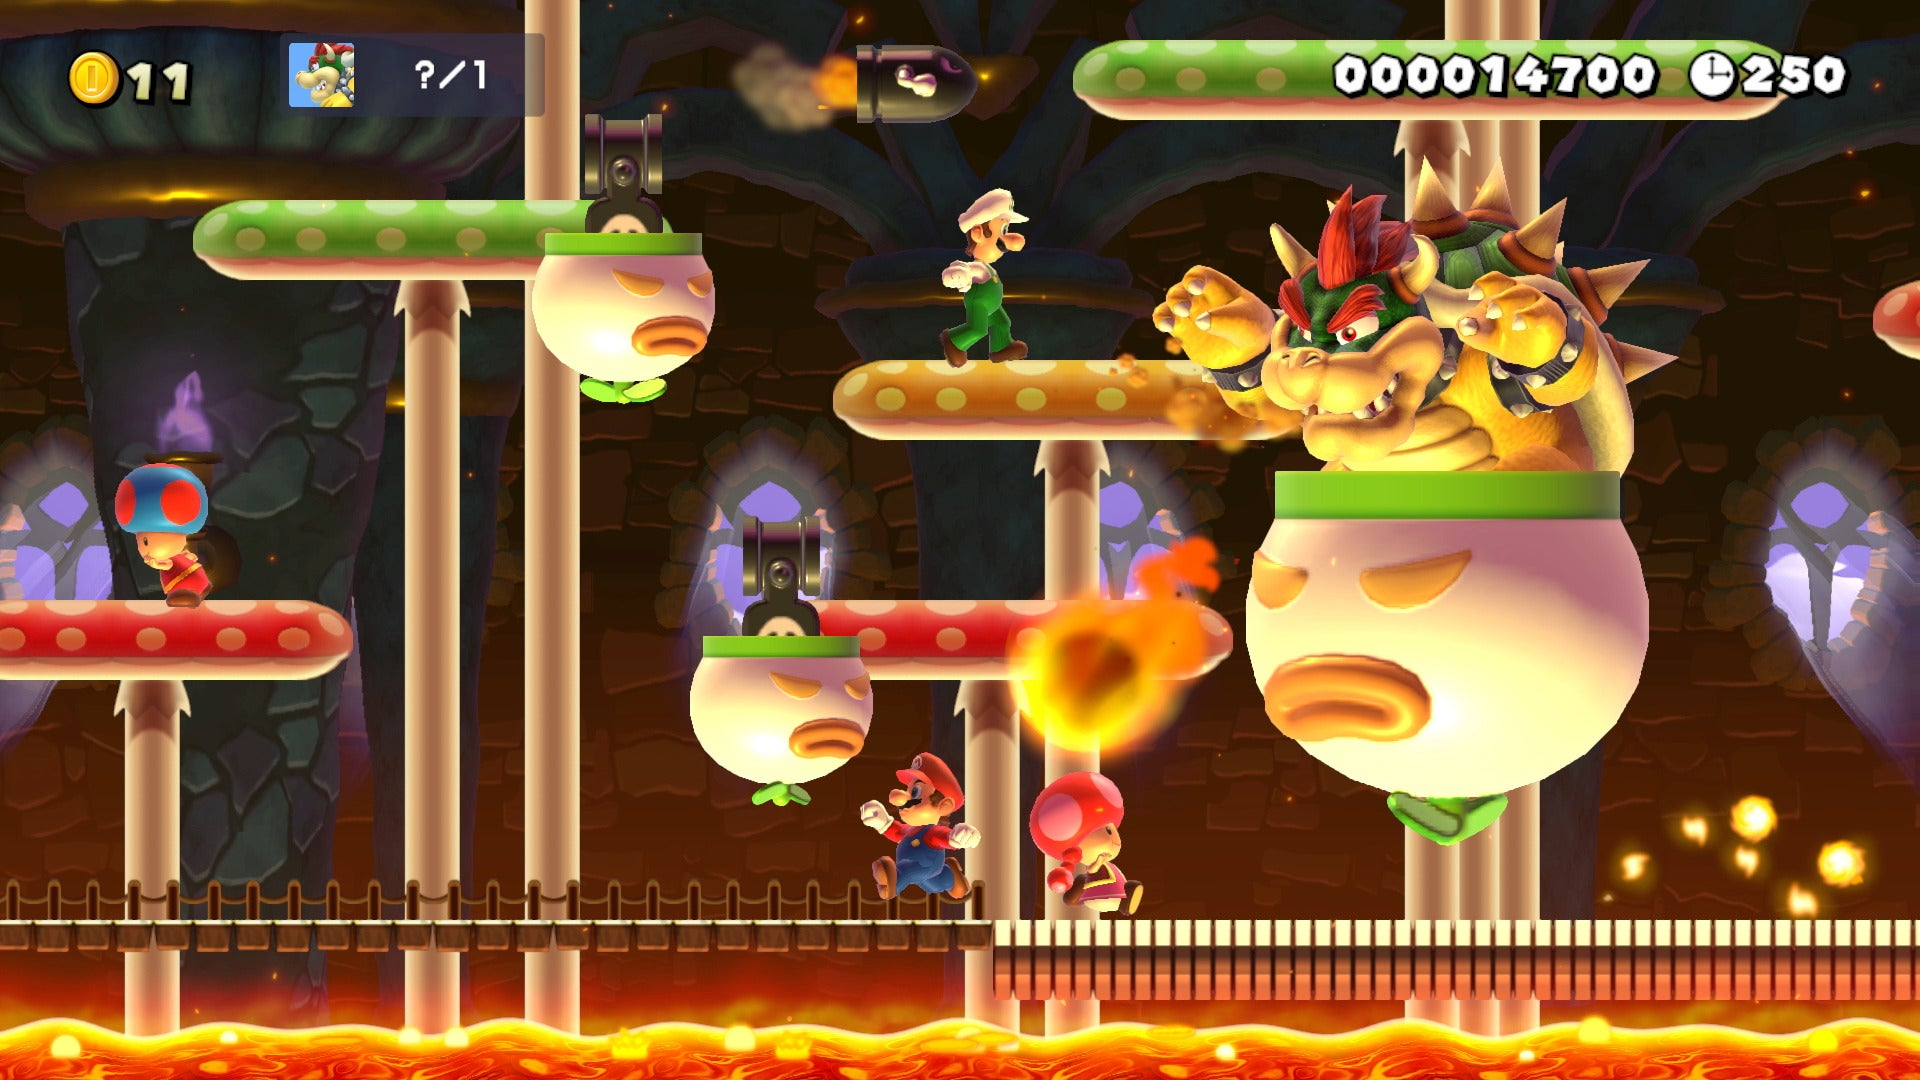 Mario Maker 2 Player Finds Useful Trick For Making Randomised Levels